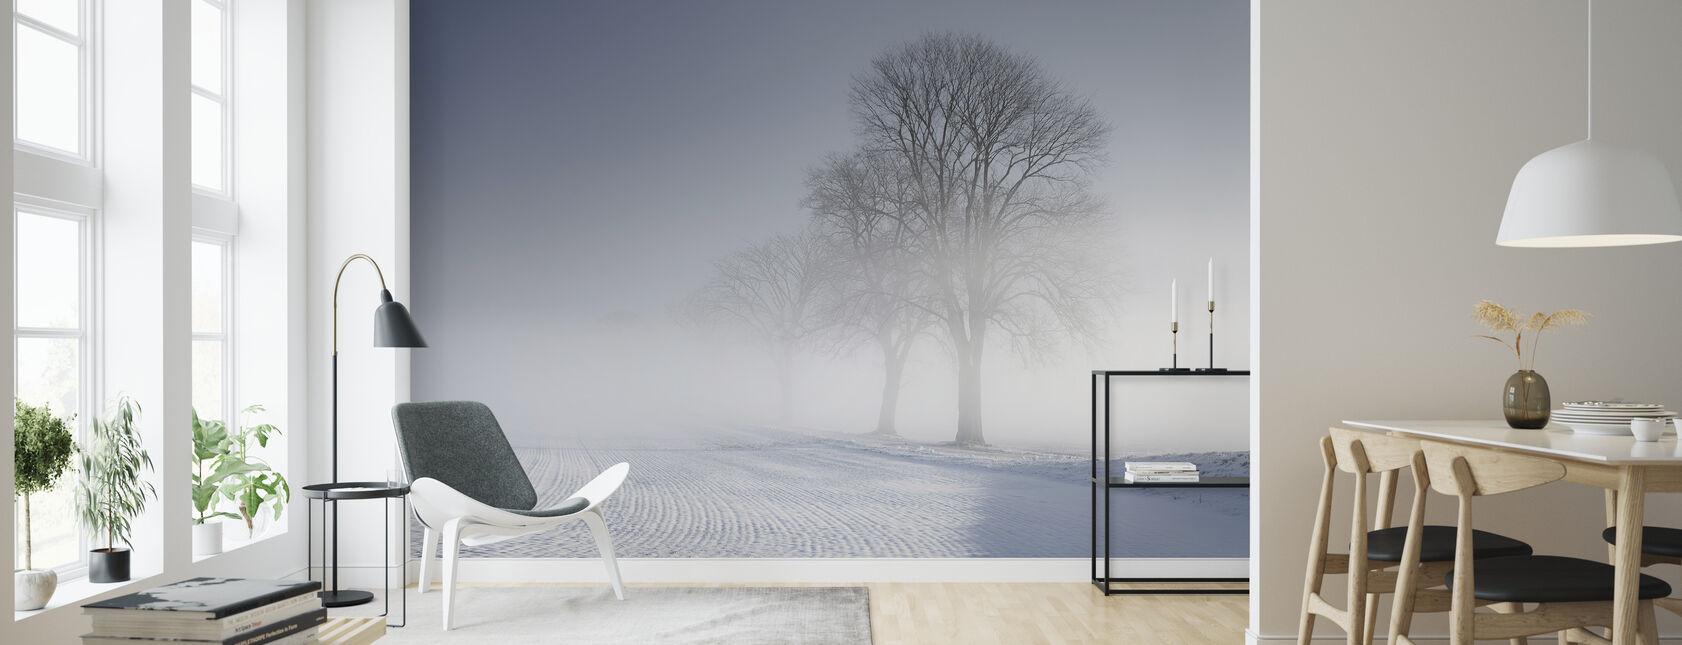 Winter Landscape in Skabersjö, Sweden - Tapet - Vardagsrum